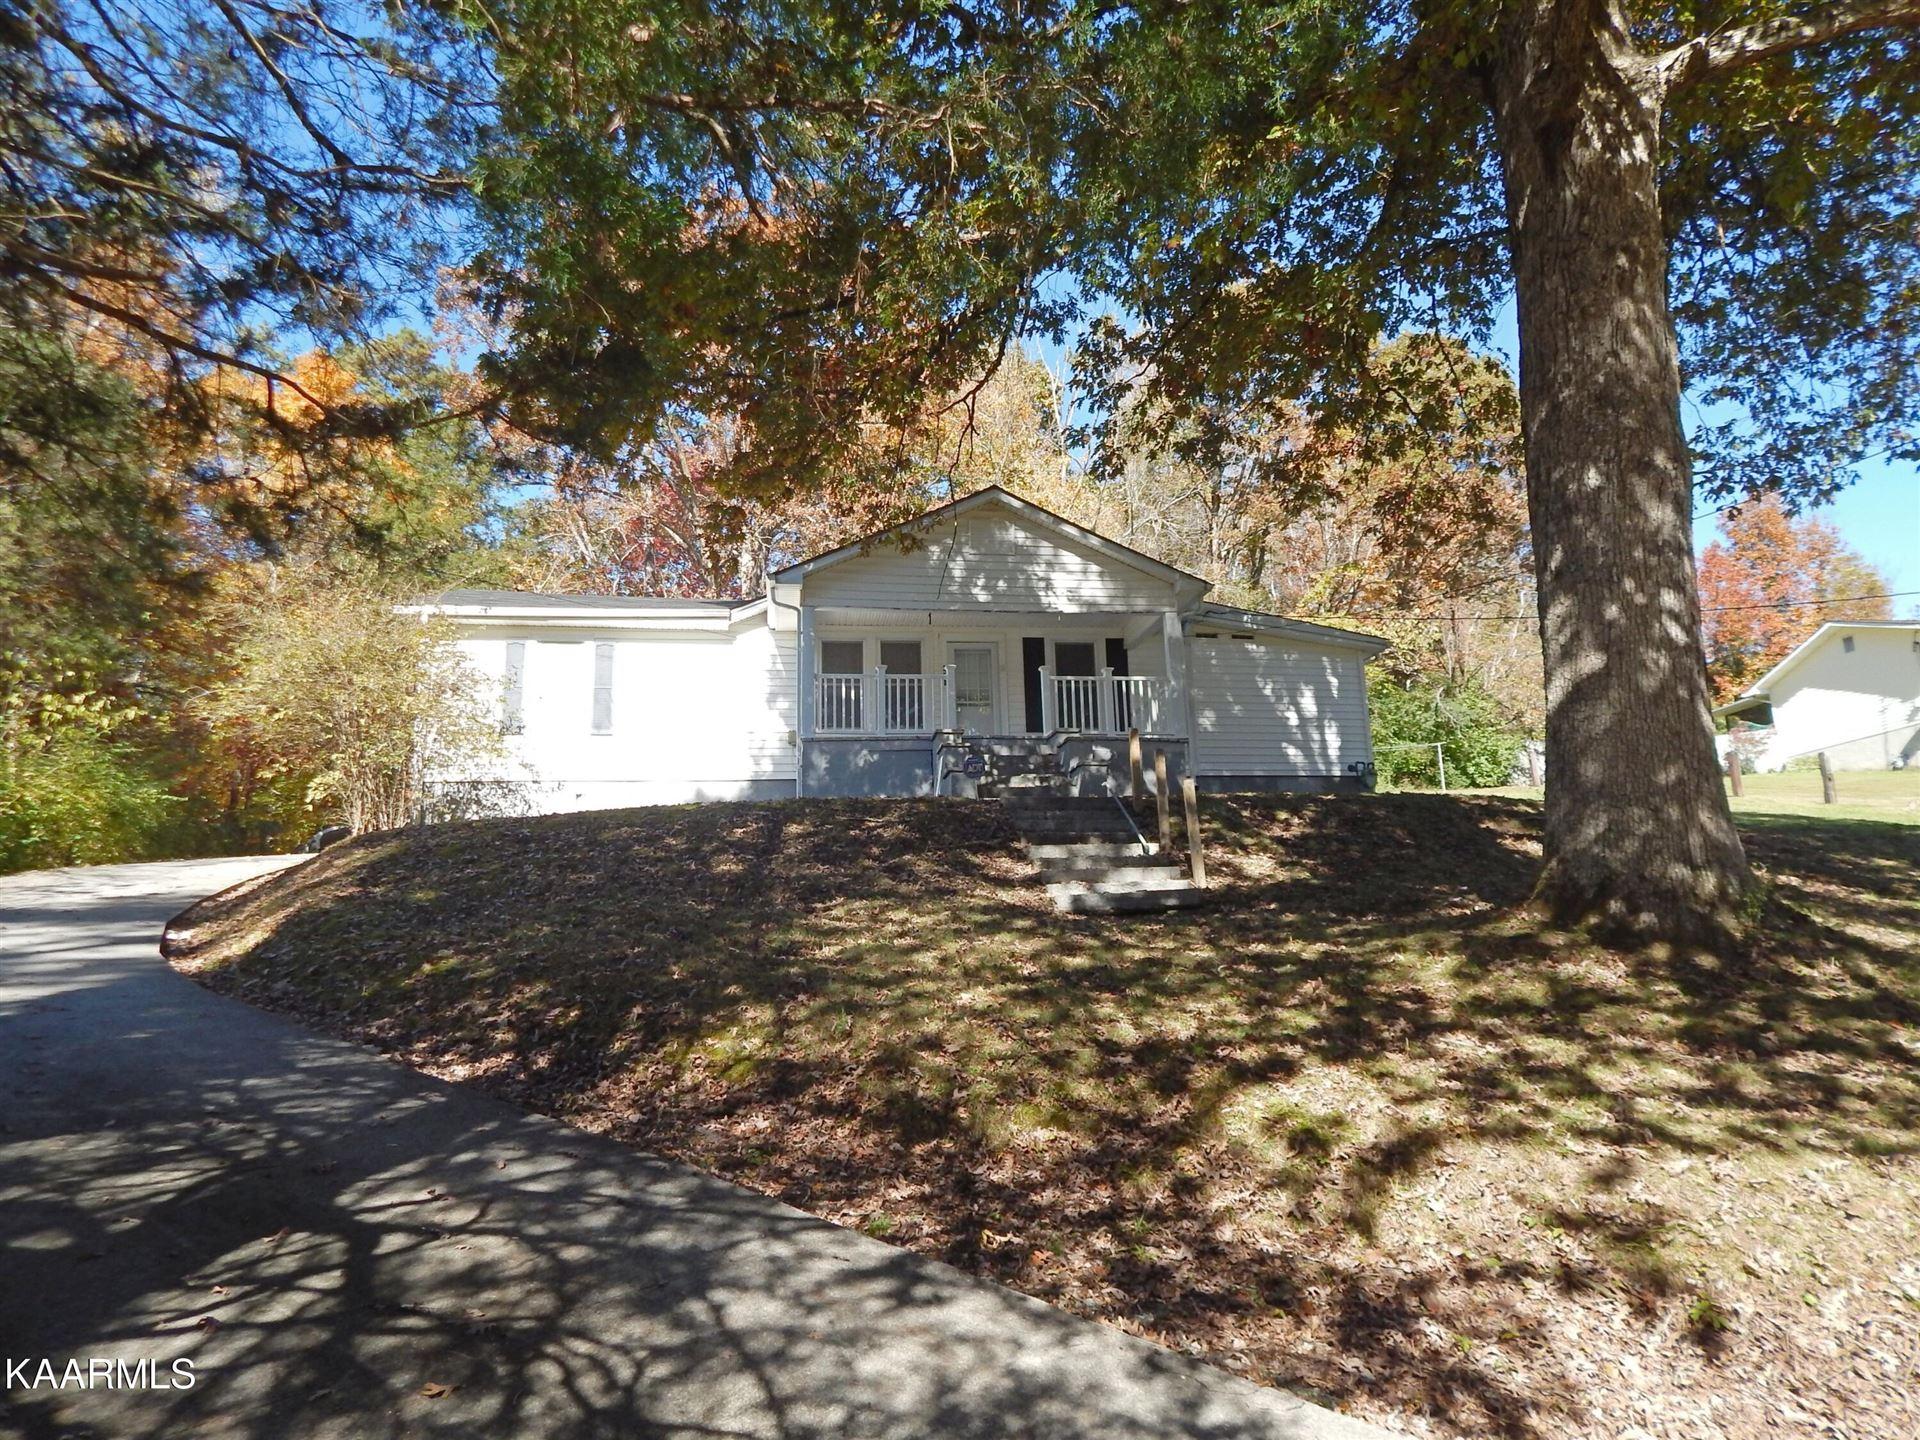 Photo of 330 Old Tacora Hills Rd, Clinton, TN 37716 (MLS # 1170887)